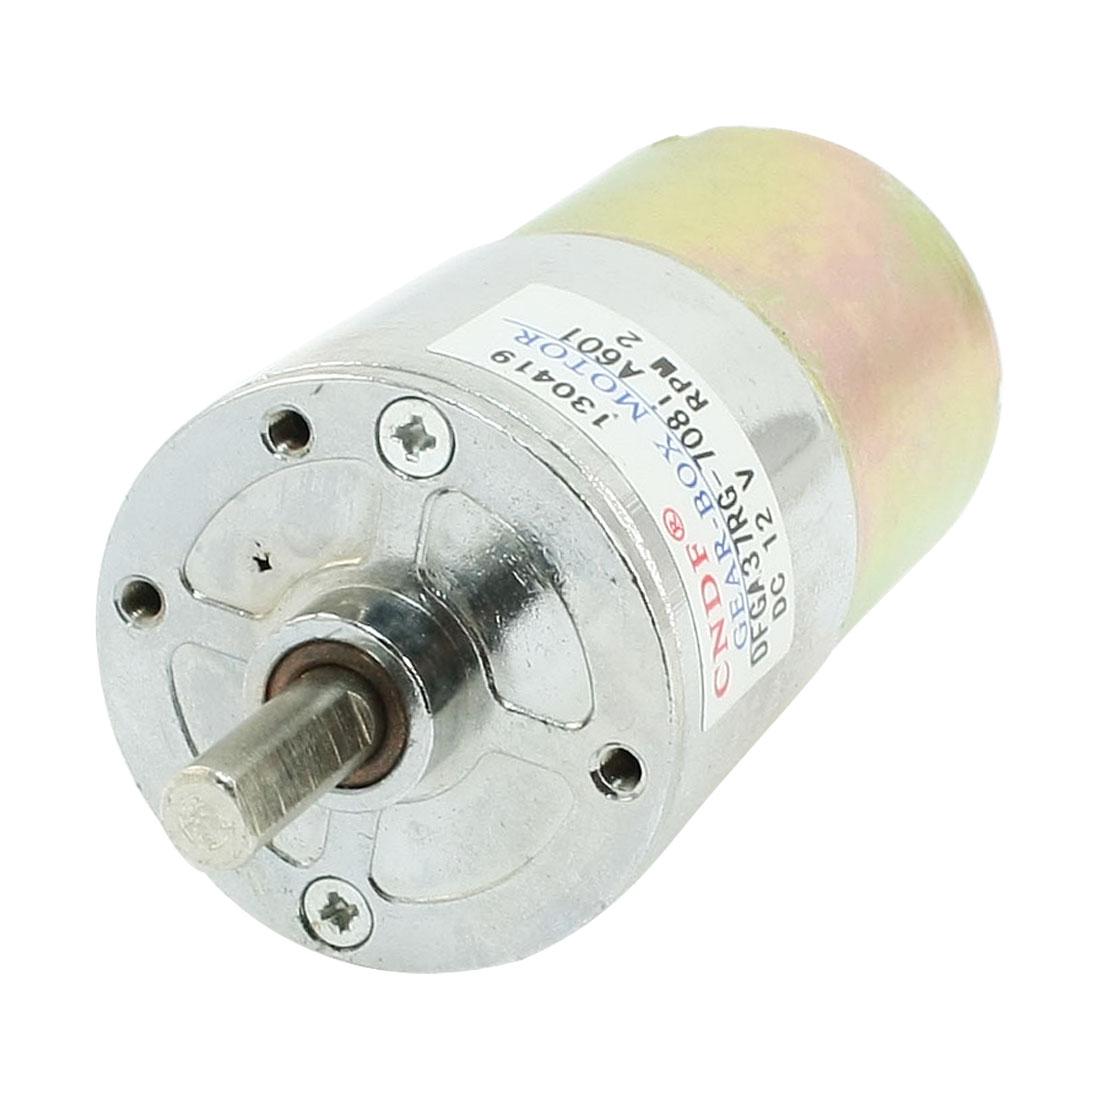 UXCELL Dfga37rg-708I Cylinder Shape  12V Speed 2 Rpm Geared Motor<br><br>Aliexpress